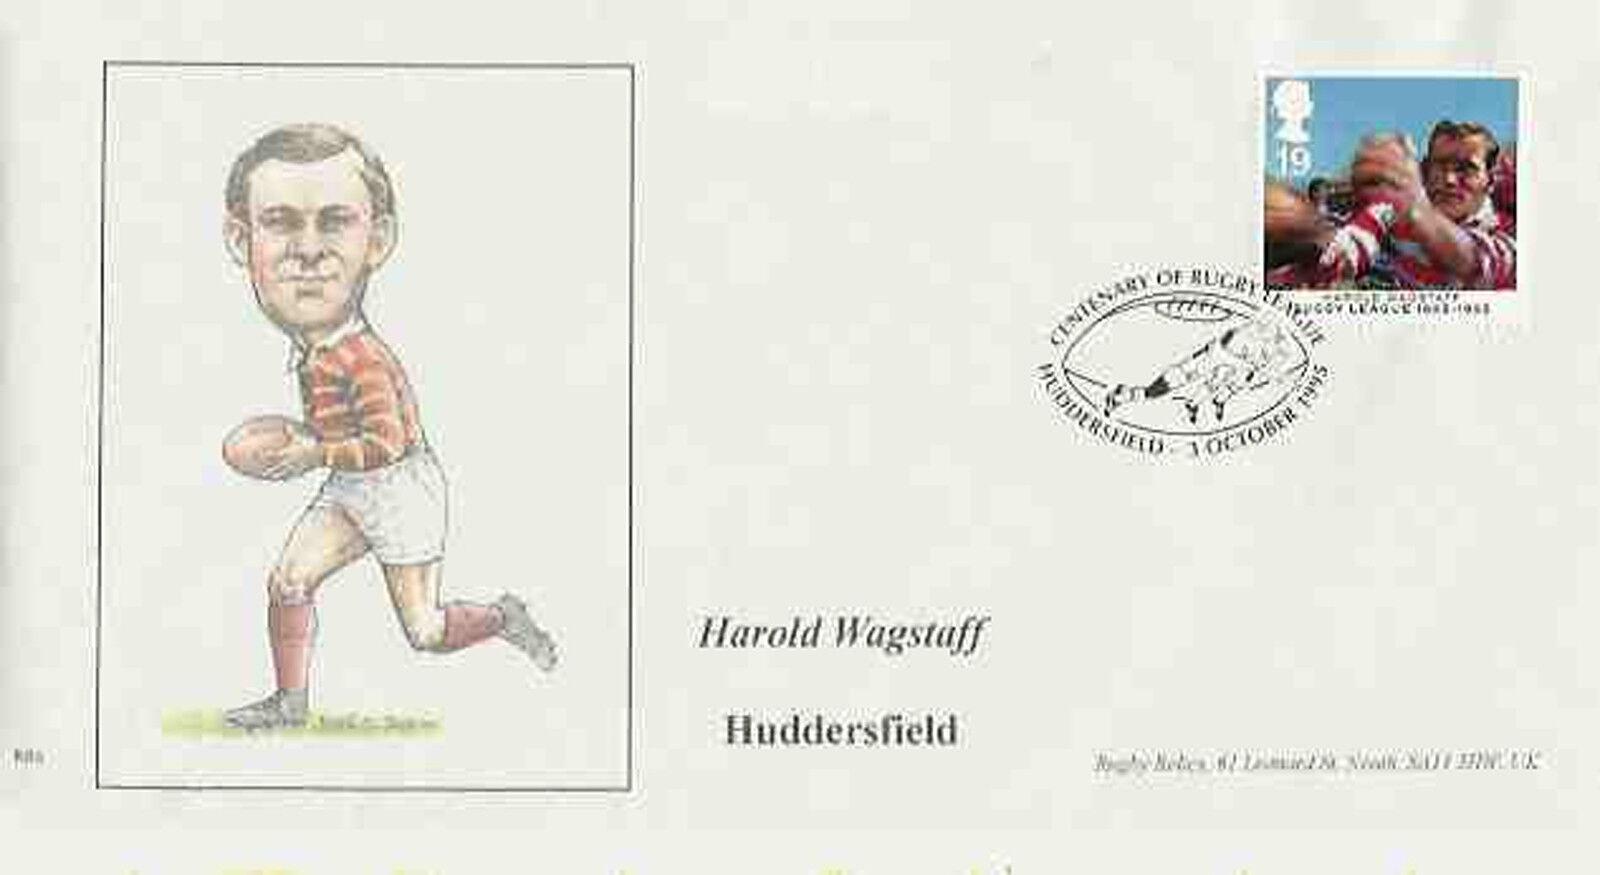 Harold wagstaff, Huddersfield, centenaire premier jour couverture Rugby League centenaire Huddersfield, en 1995 a85653